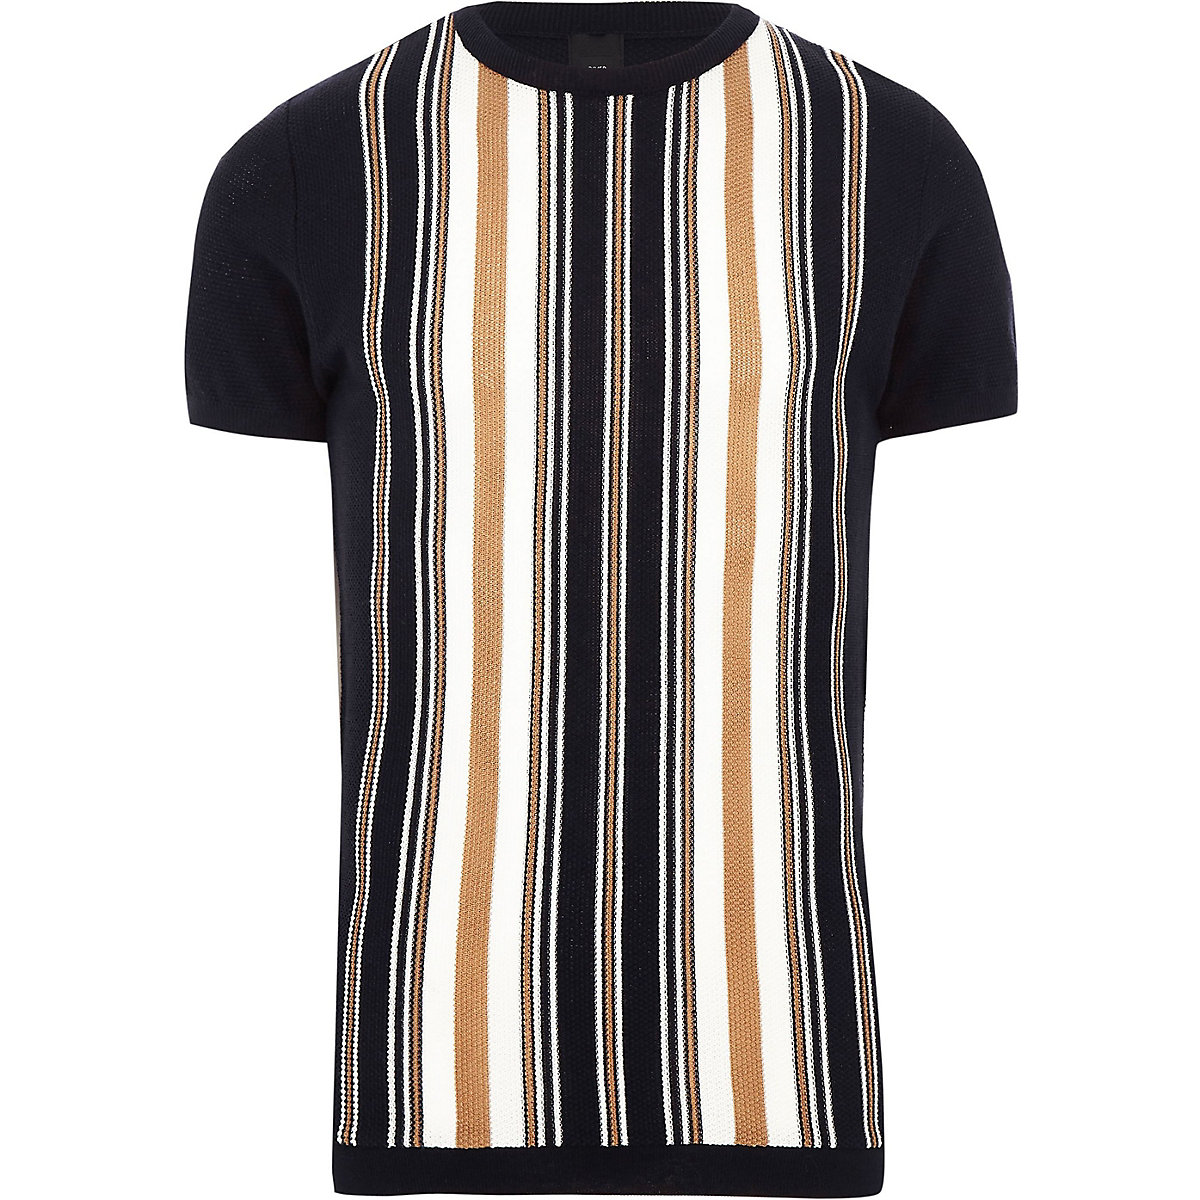 Big and Tall navy stripe T-shirt